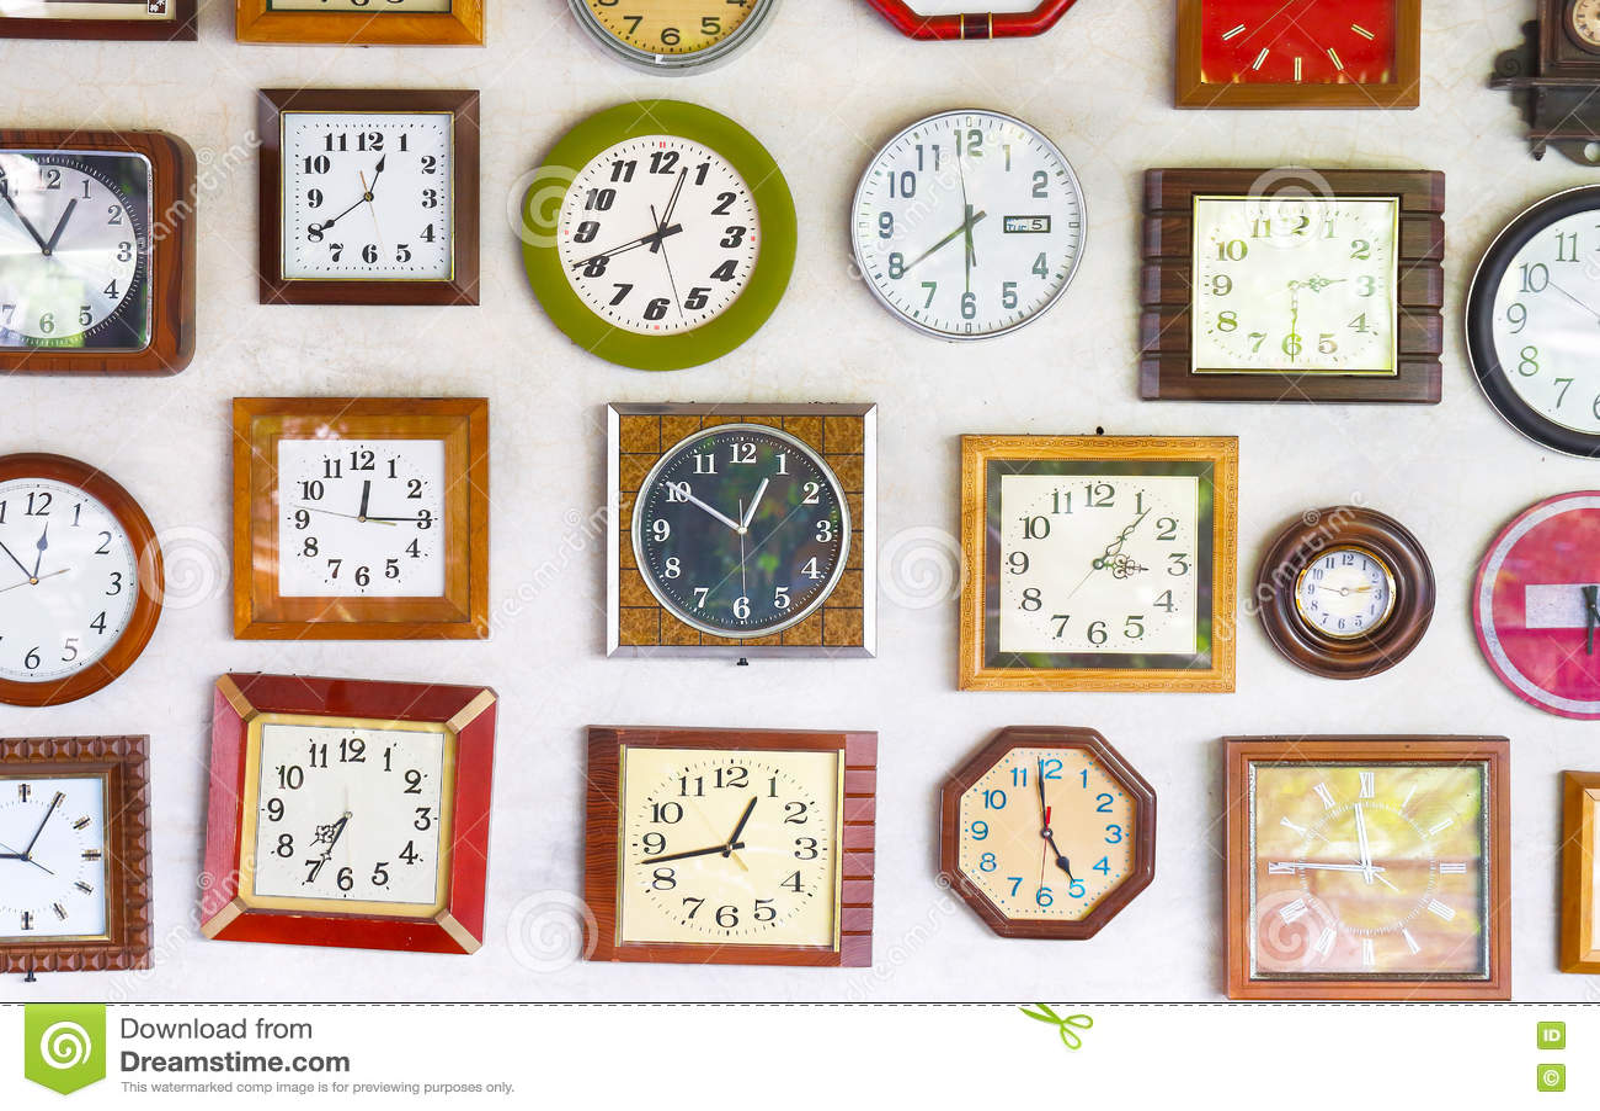 wall clocks stock image